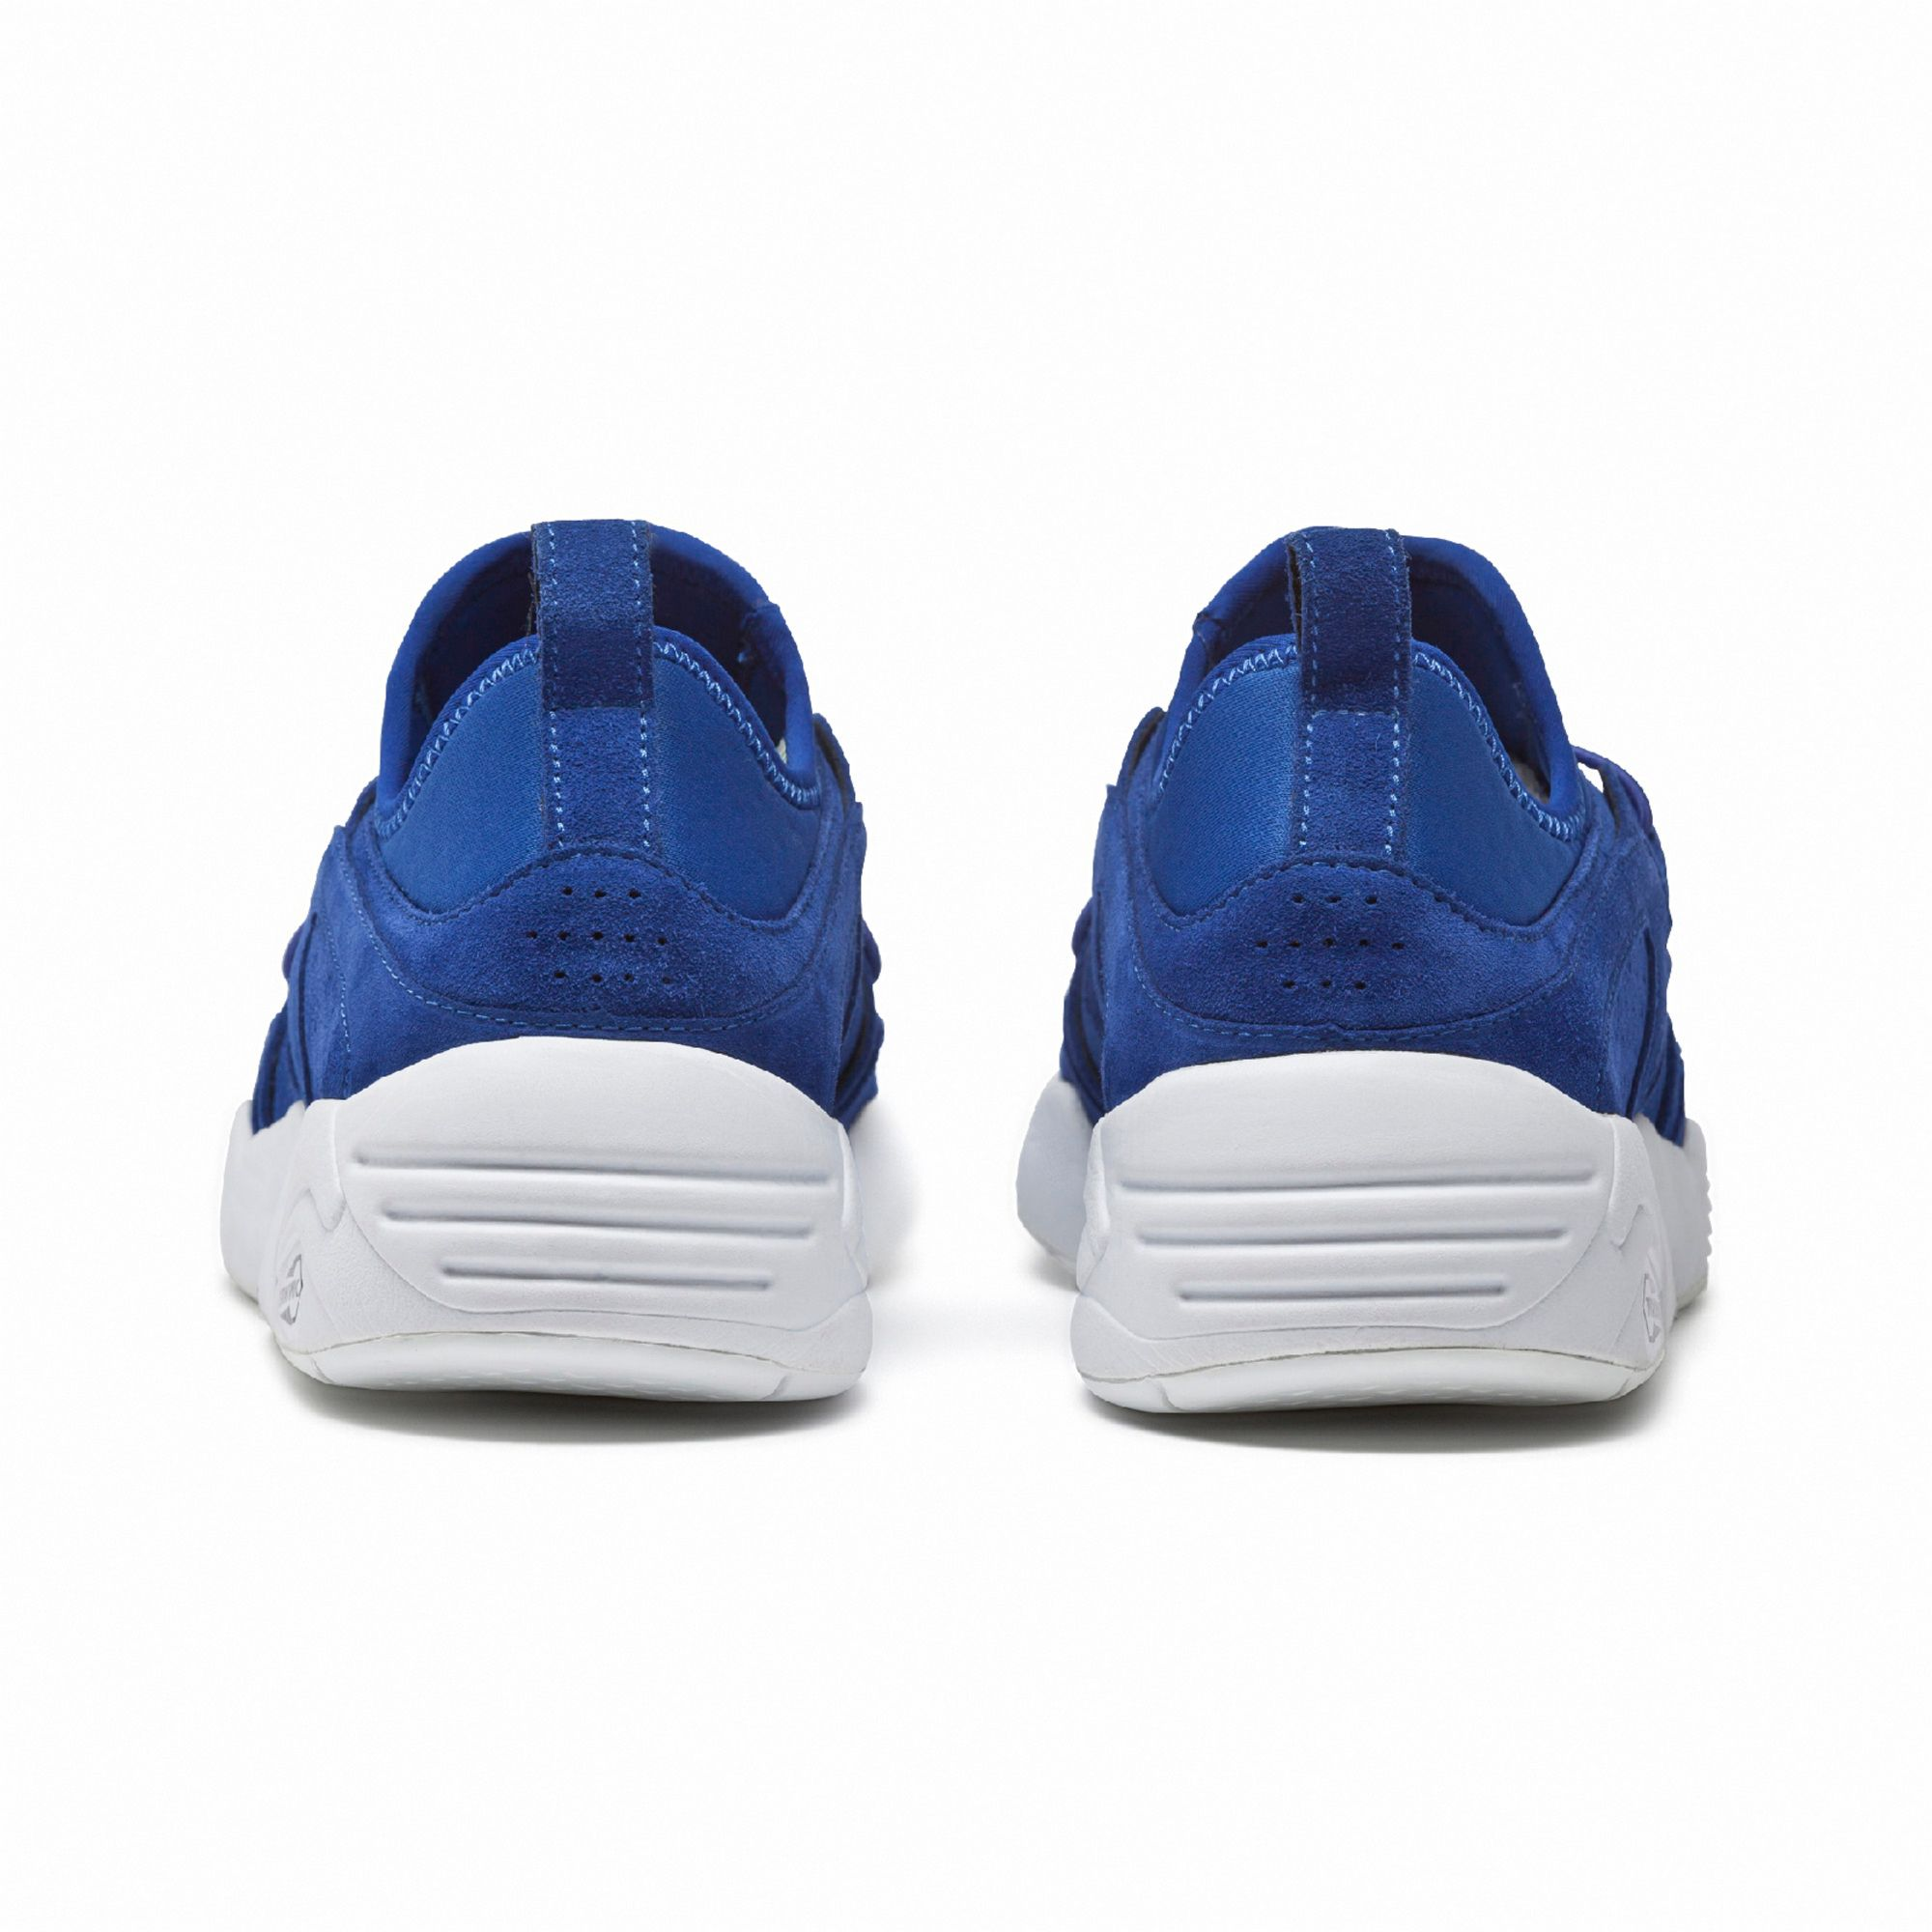 Chaussures Neuf Puma Of Unisexe Soft Blaze Glory TwYICw